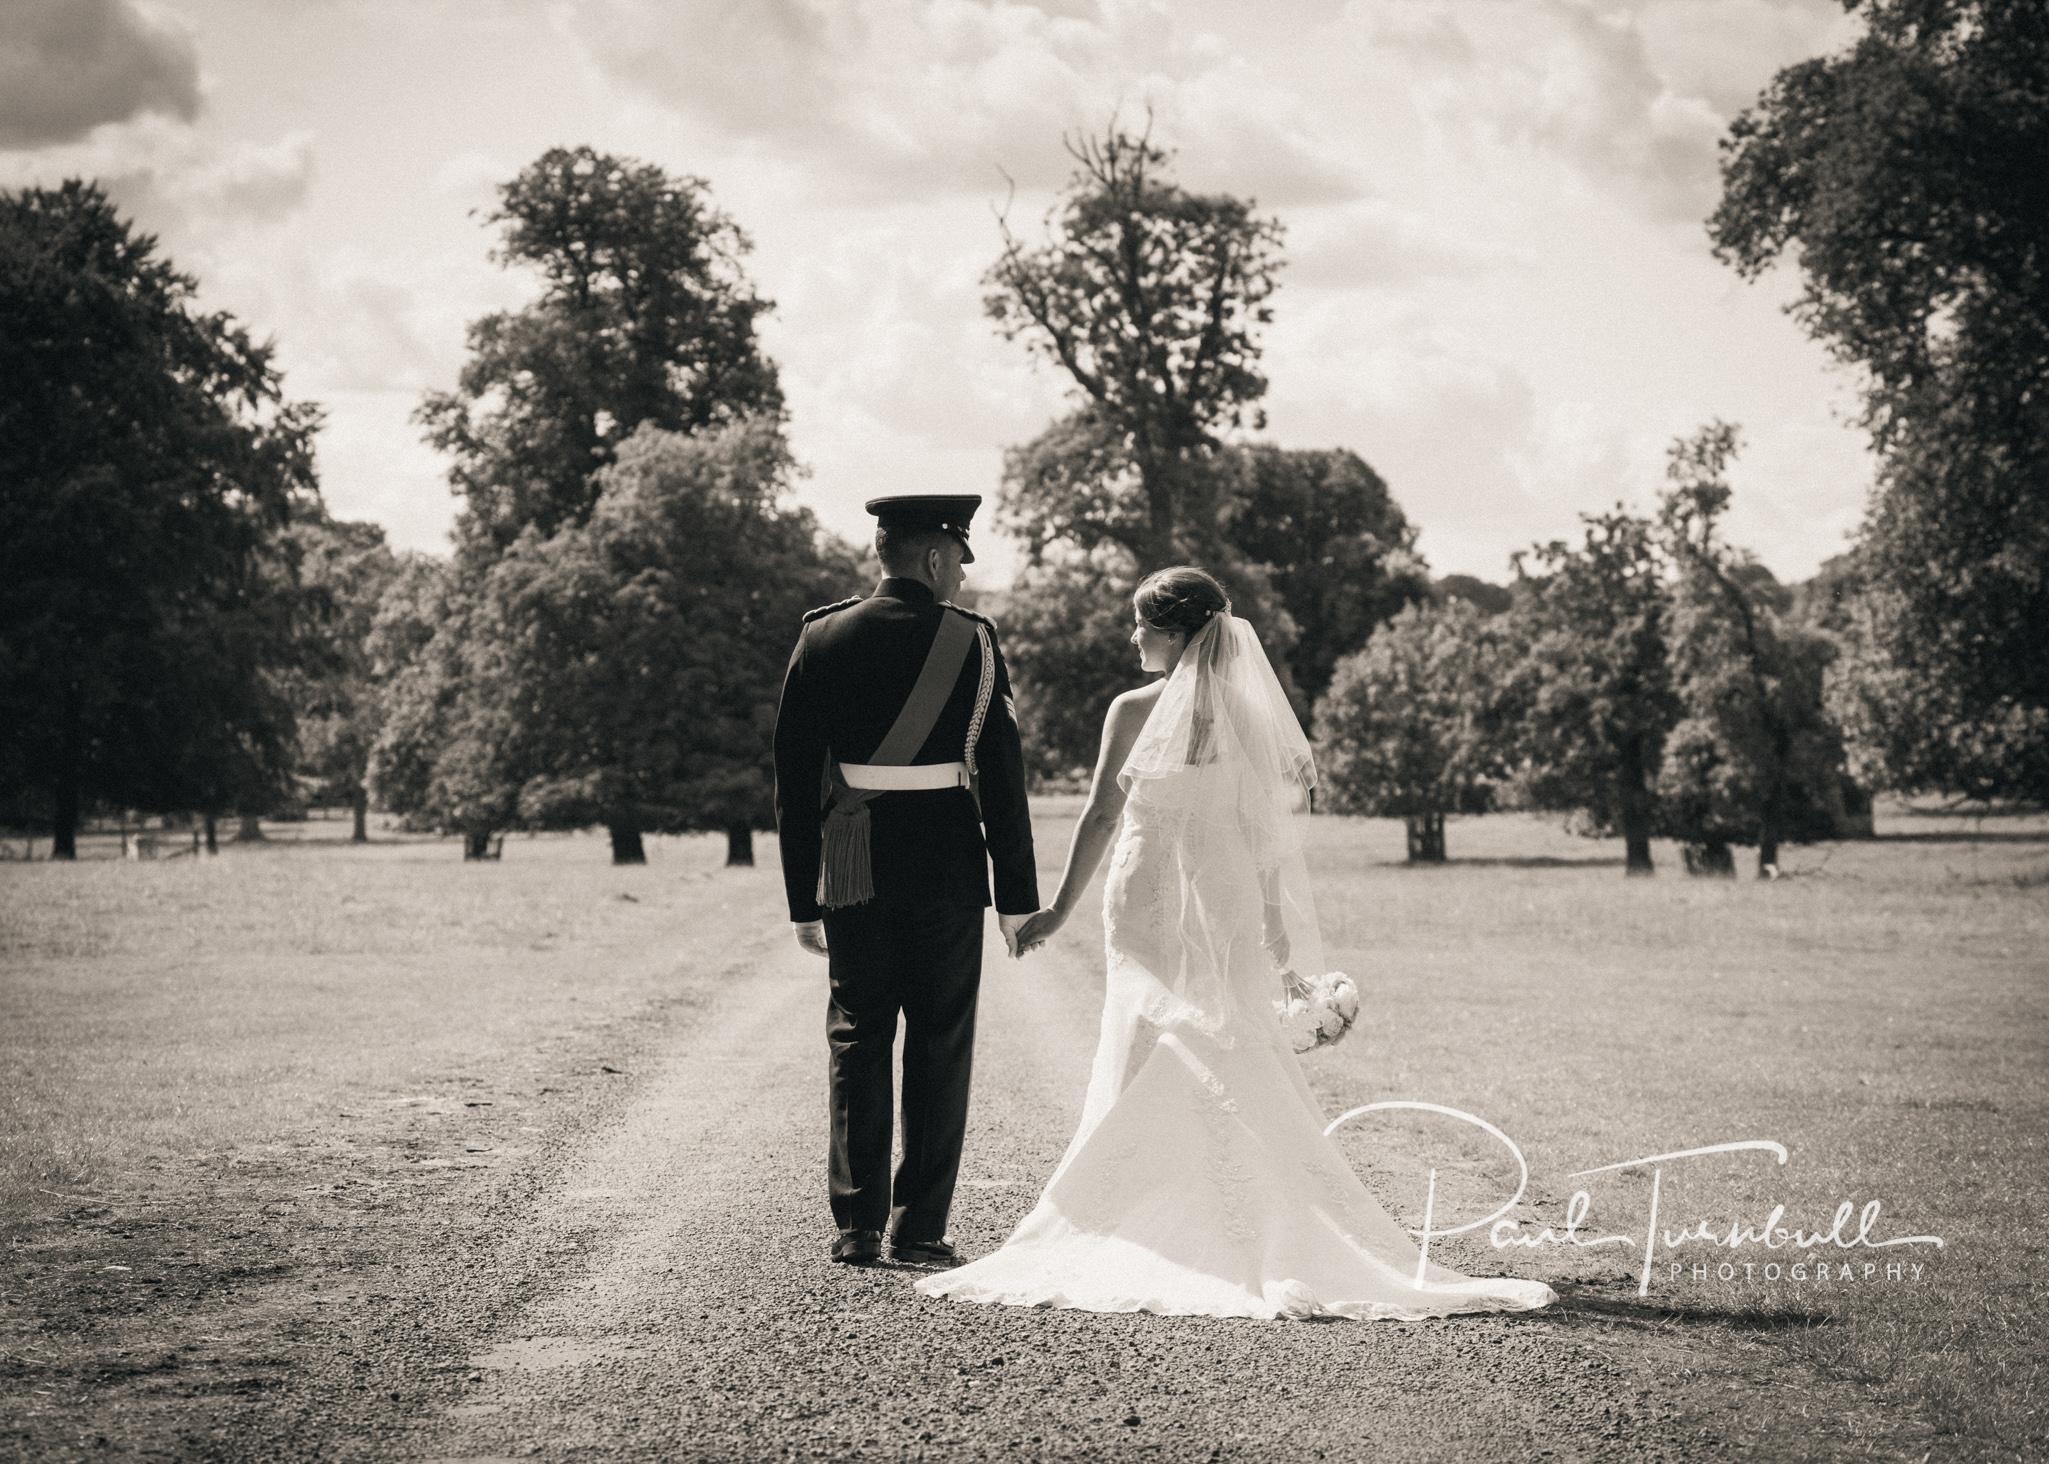 wedding-photographer-south-dalton-walkington-yorkshire-emma-james-051.jpg